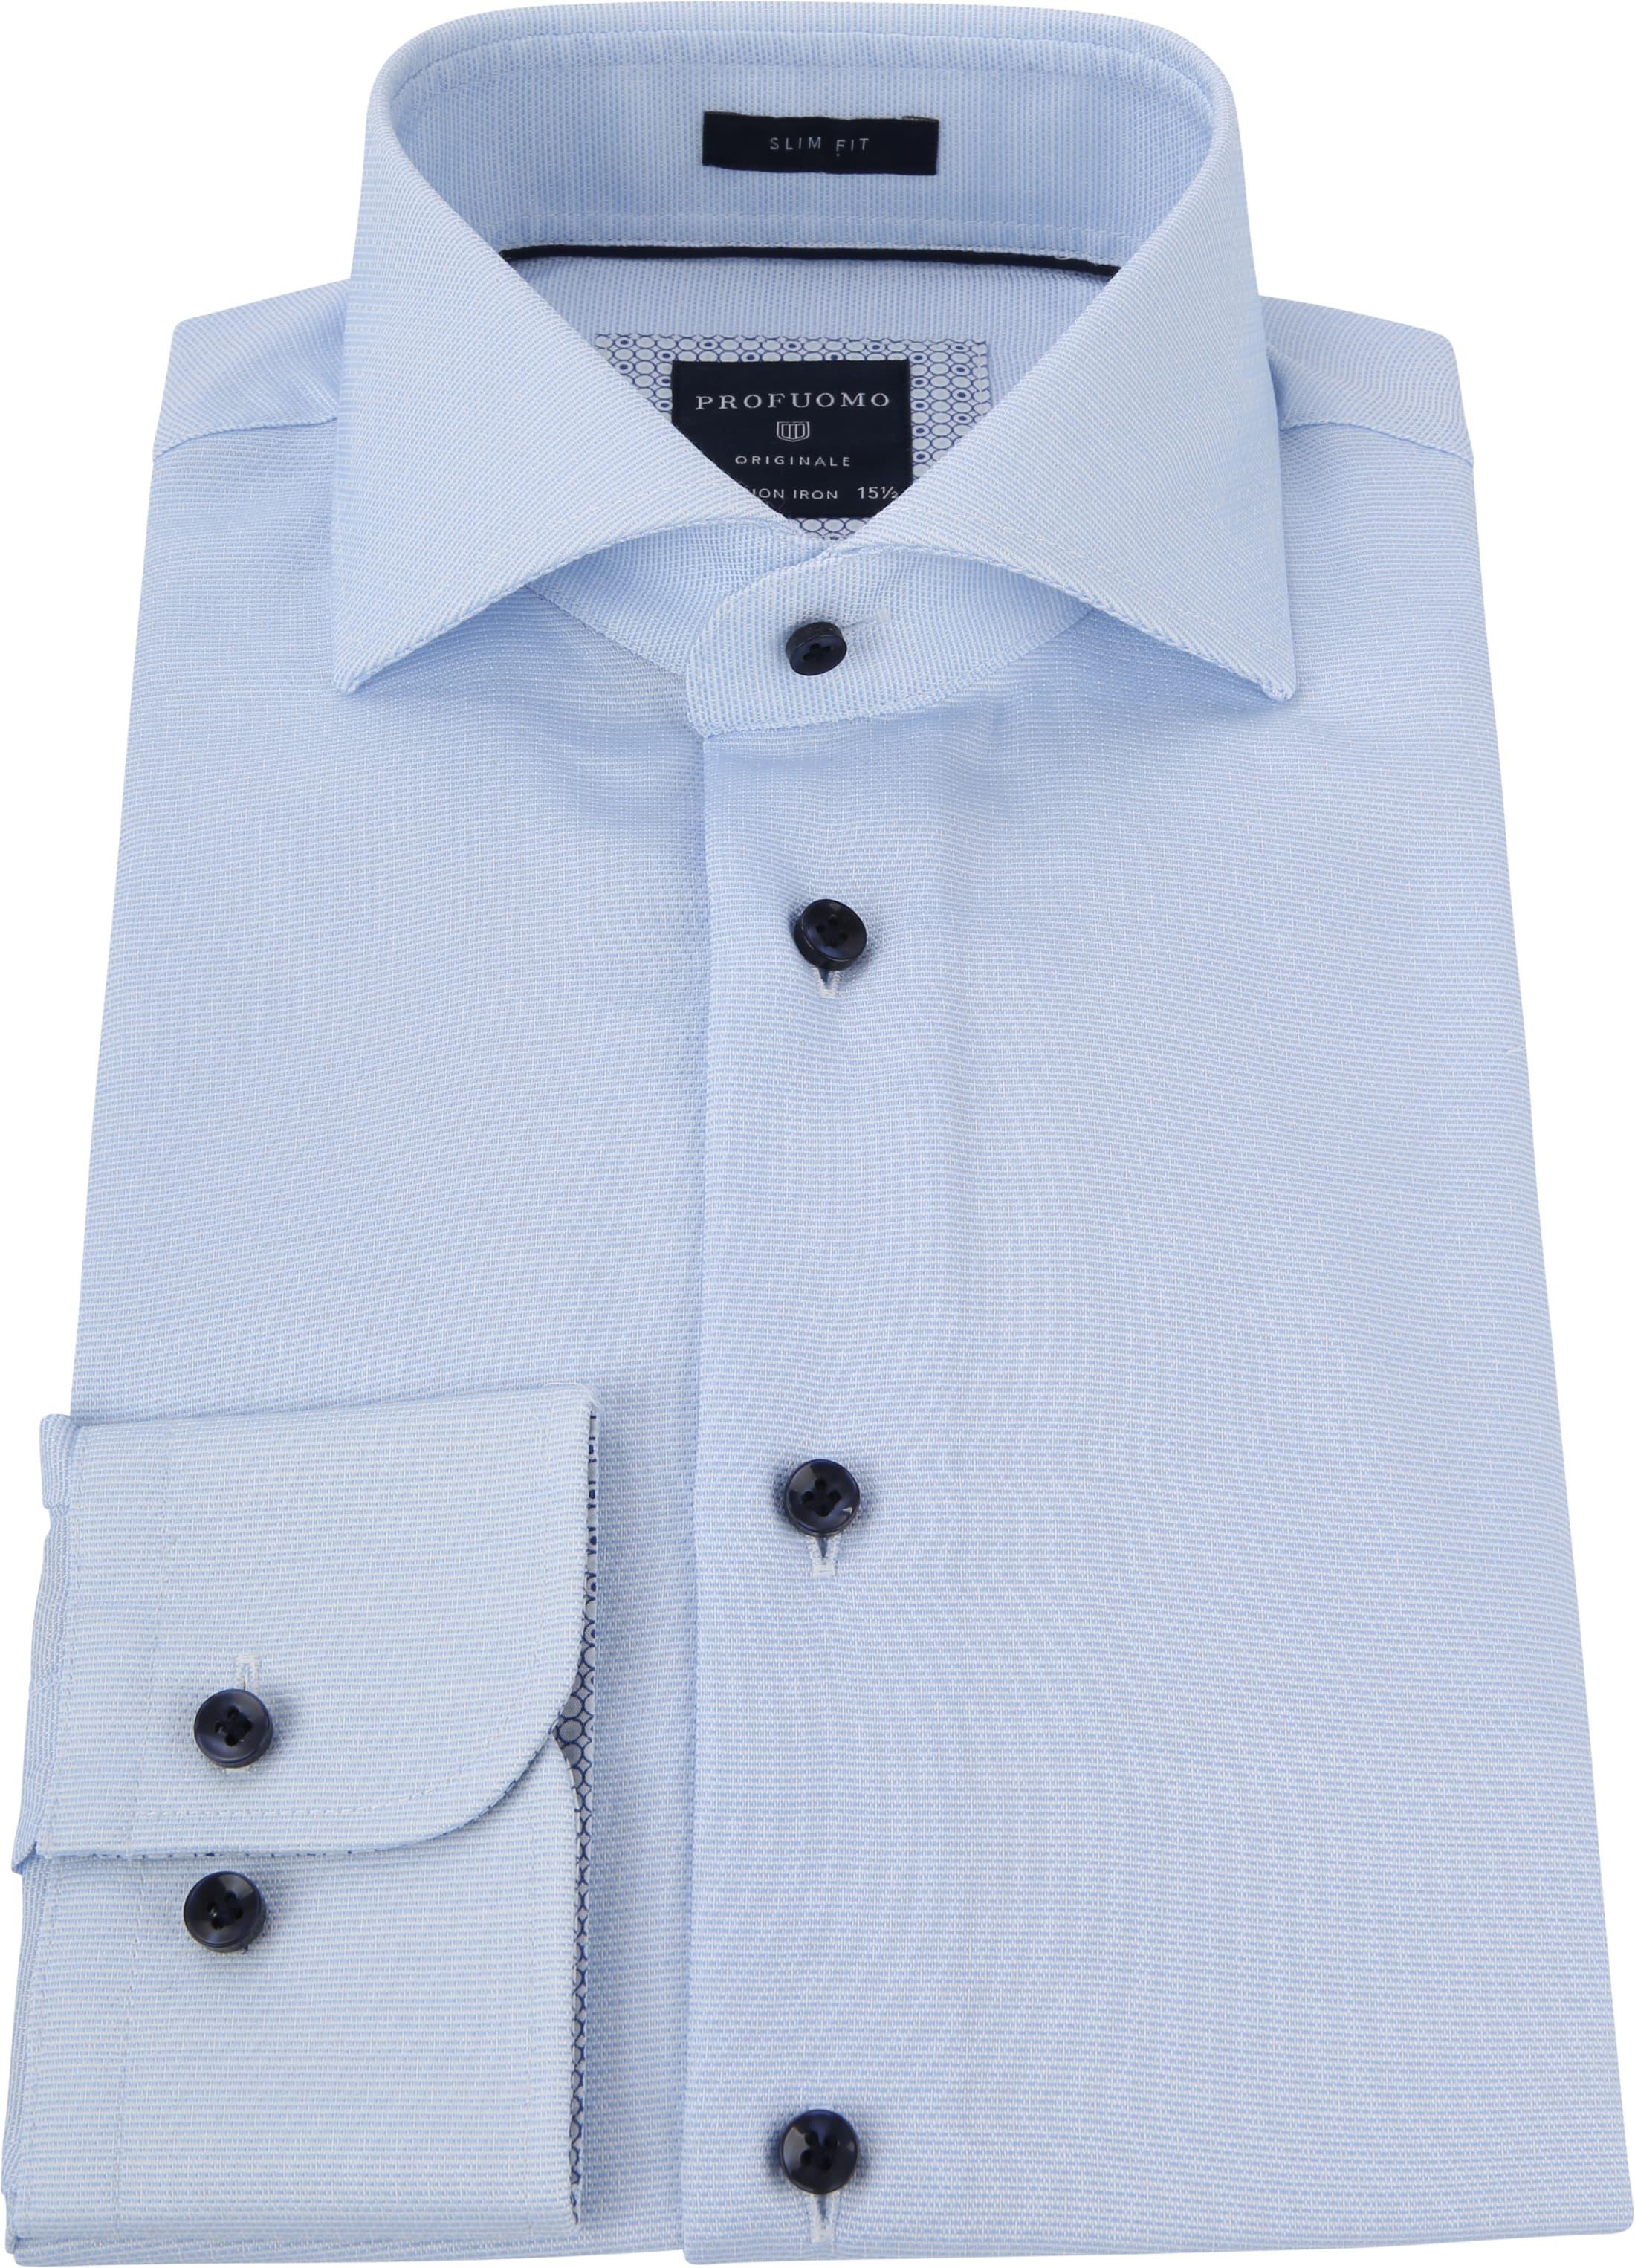 Profuomo Shirt Dobby Light Blue foto 3